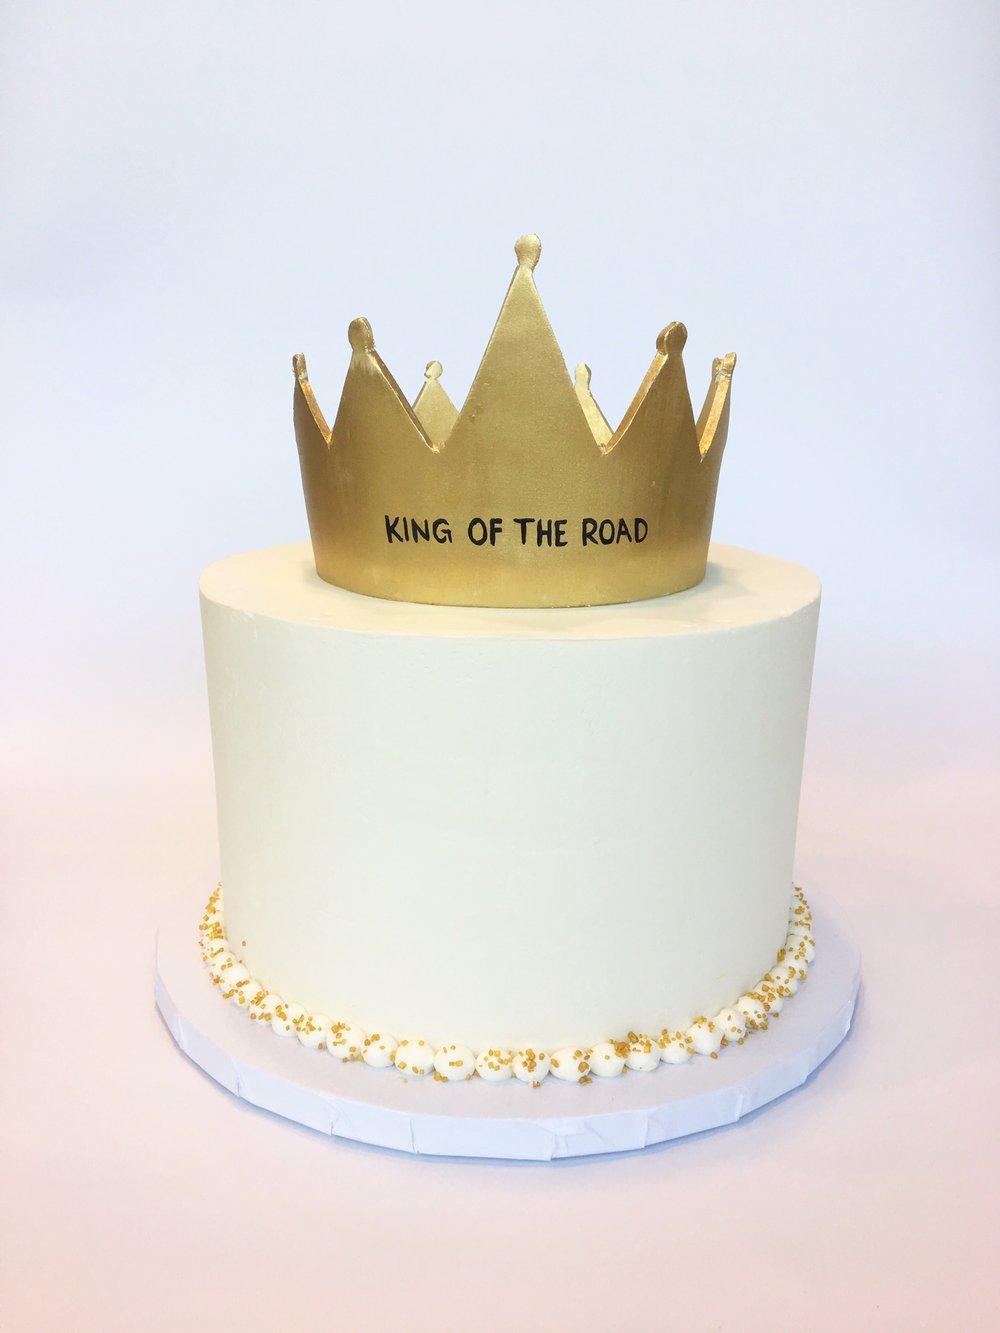 King of the road cake.jpg